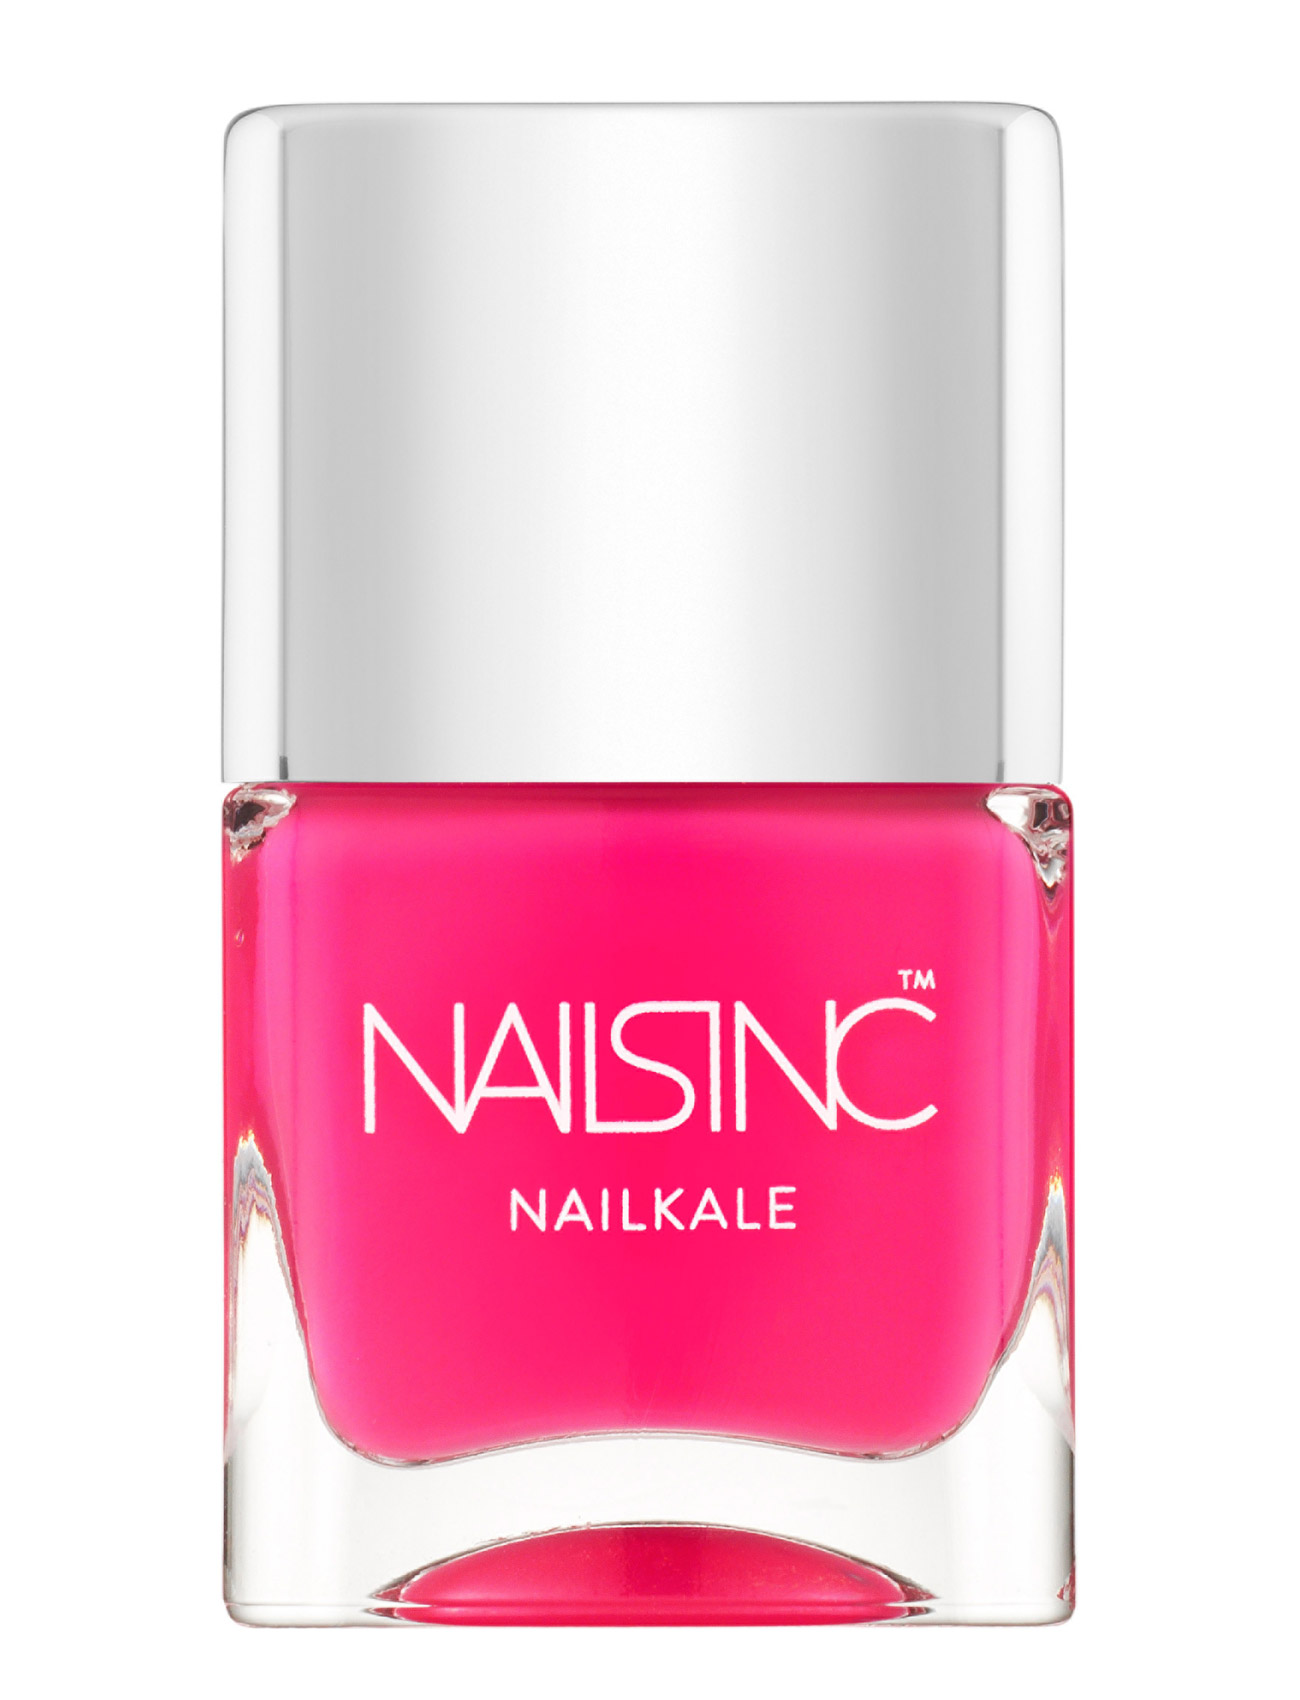 nails inc Nailkale holland walk på boozt.com dk